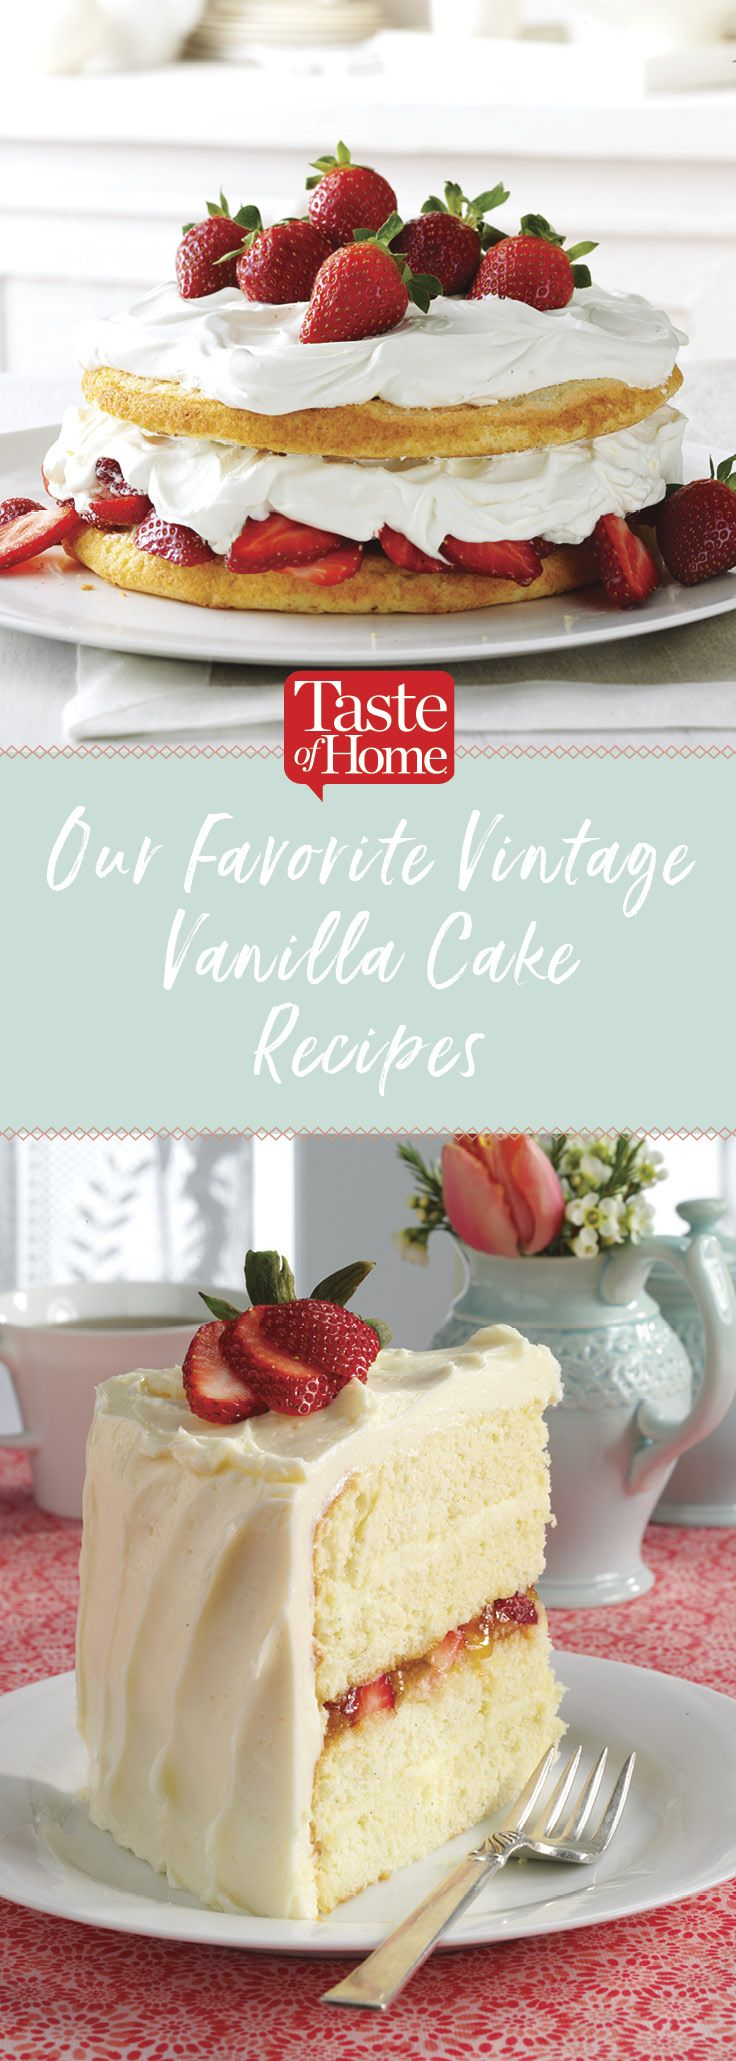 Our Favorite Vintage Vanilla Cake Recipes